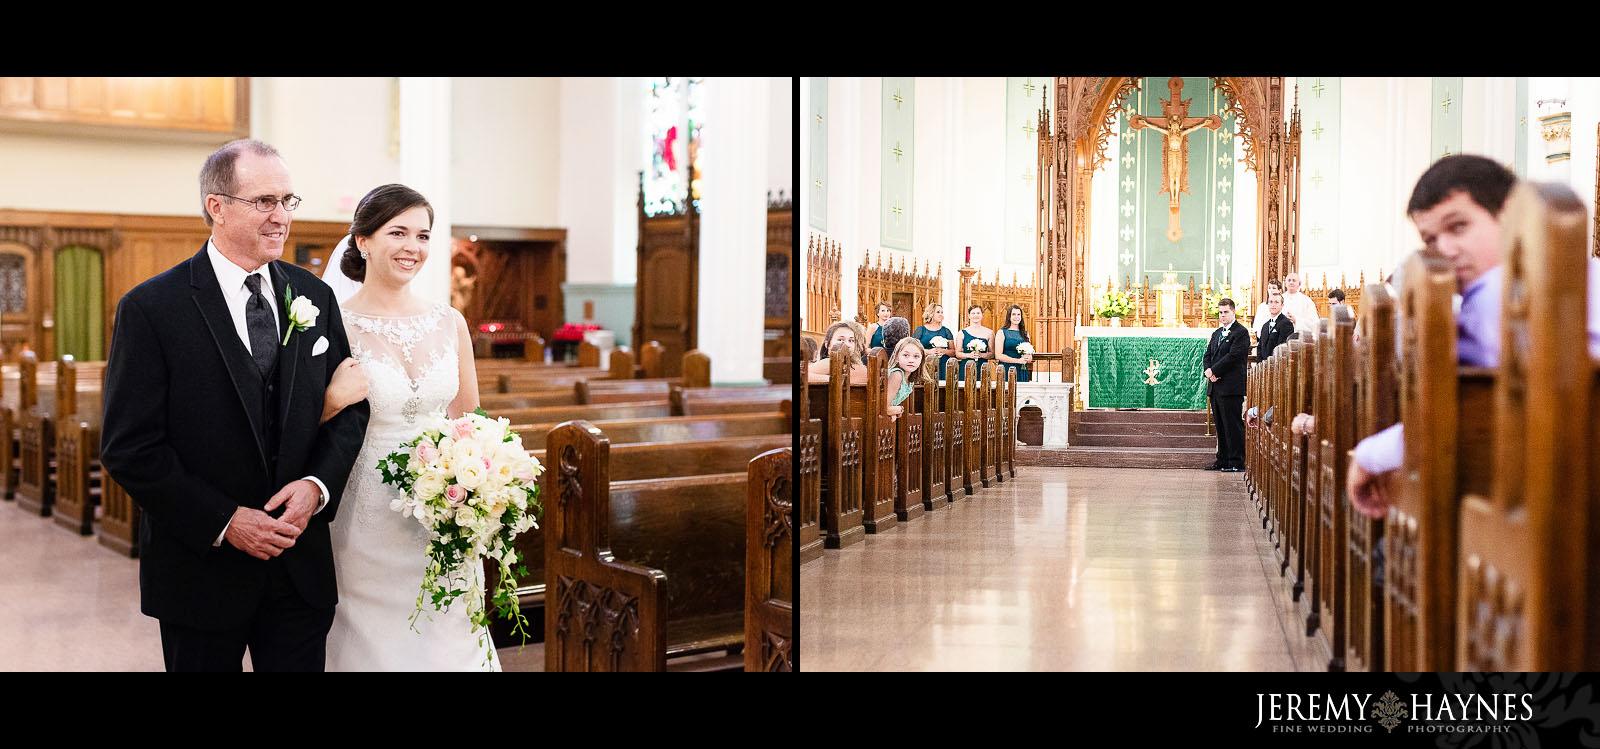 st-louis-bertrand-catholic-church-wedding-ceremony-1.jpg